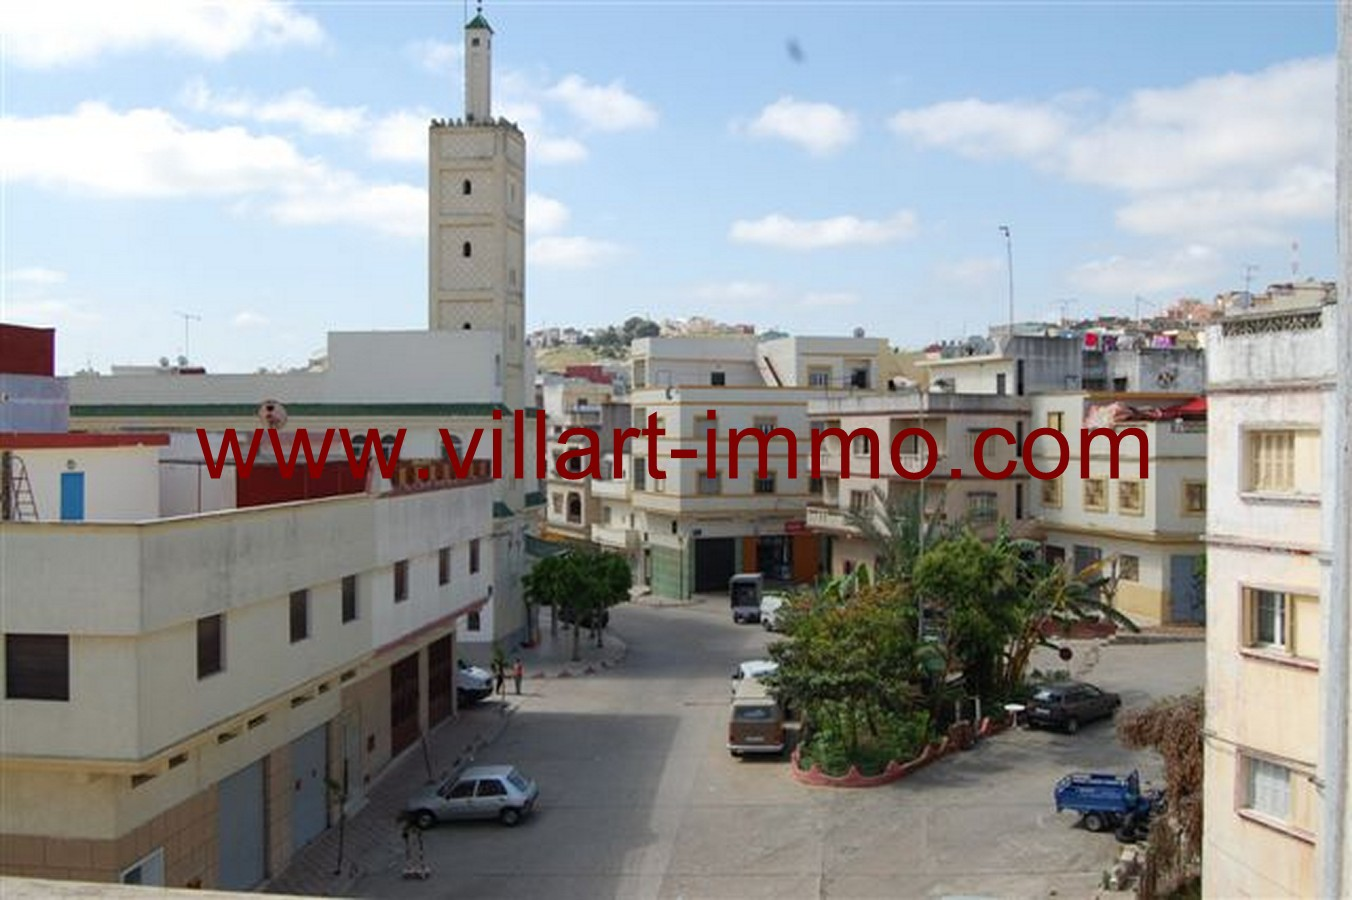 1-Vente-Appartement-Tanger-Vue-VA532-Jirari-Villart Immo